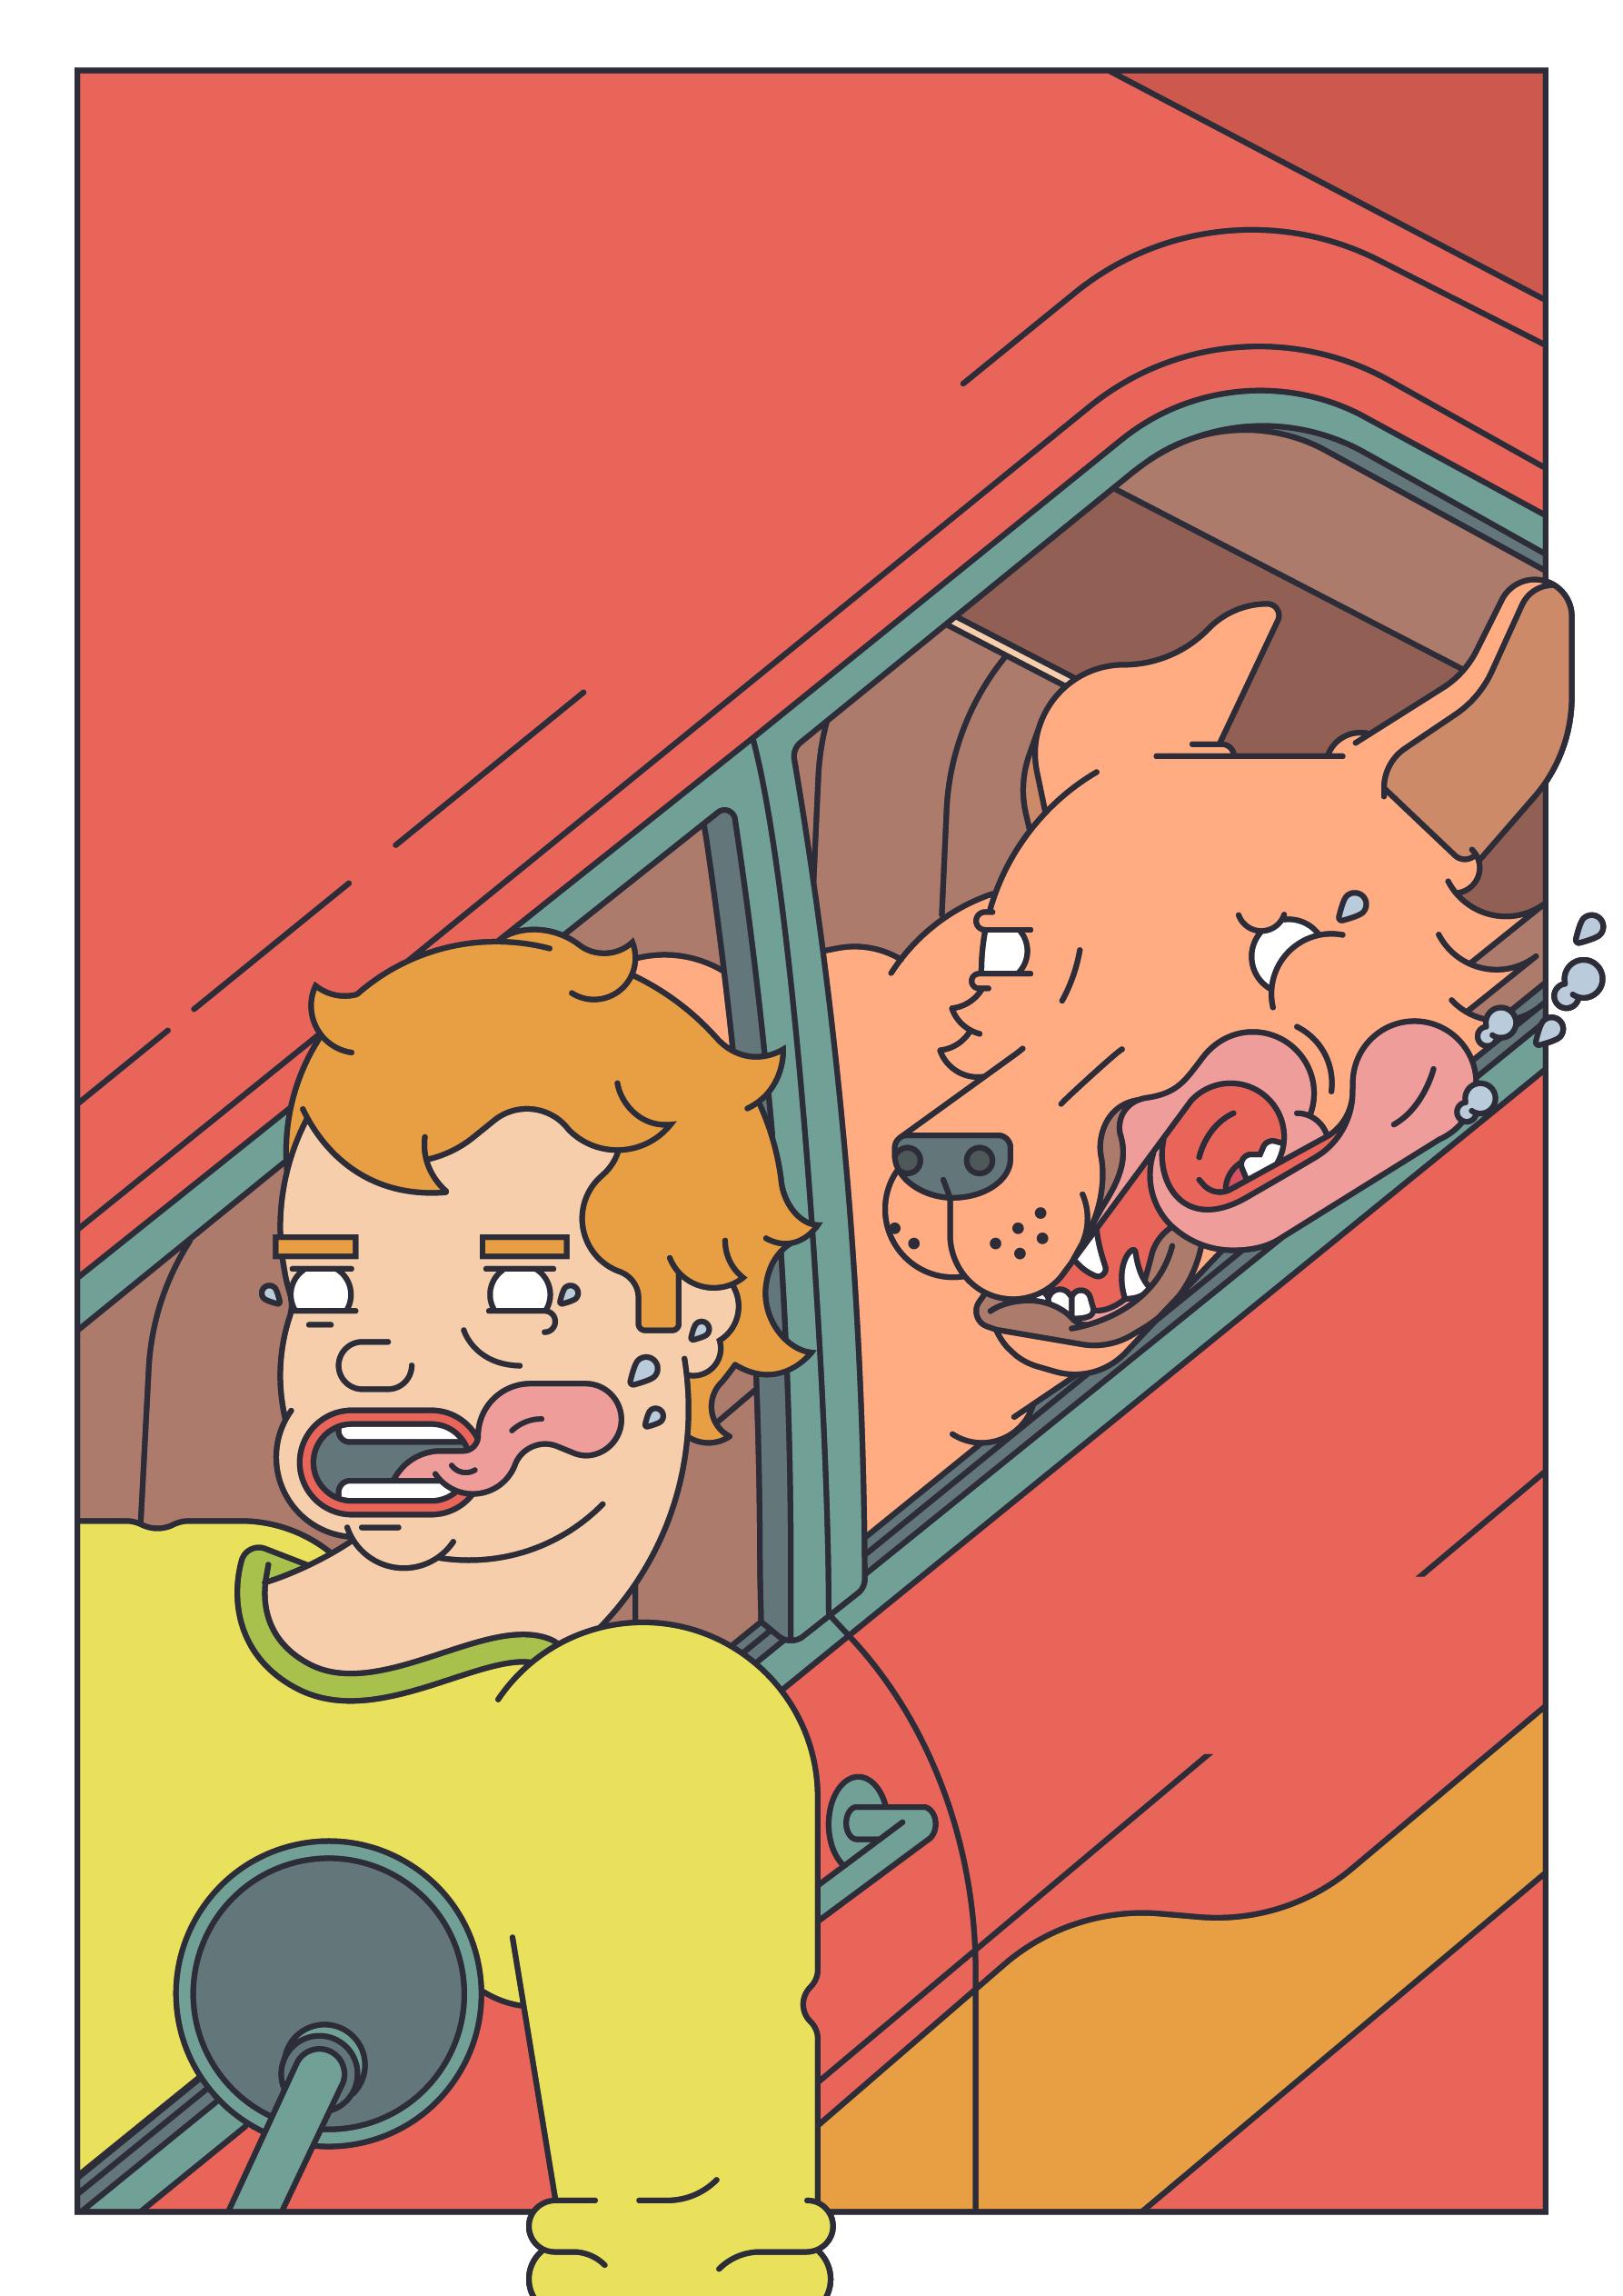 BloodBros. illustration - 77_Mixam_HumanTongue